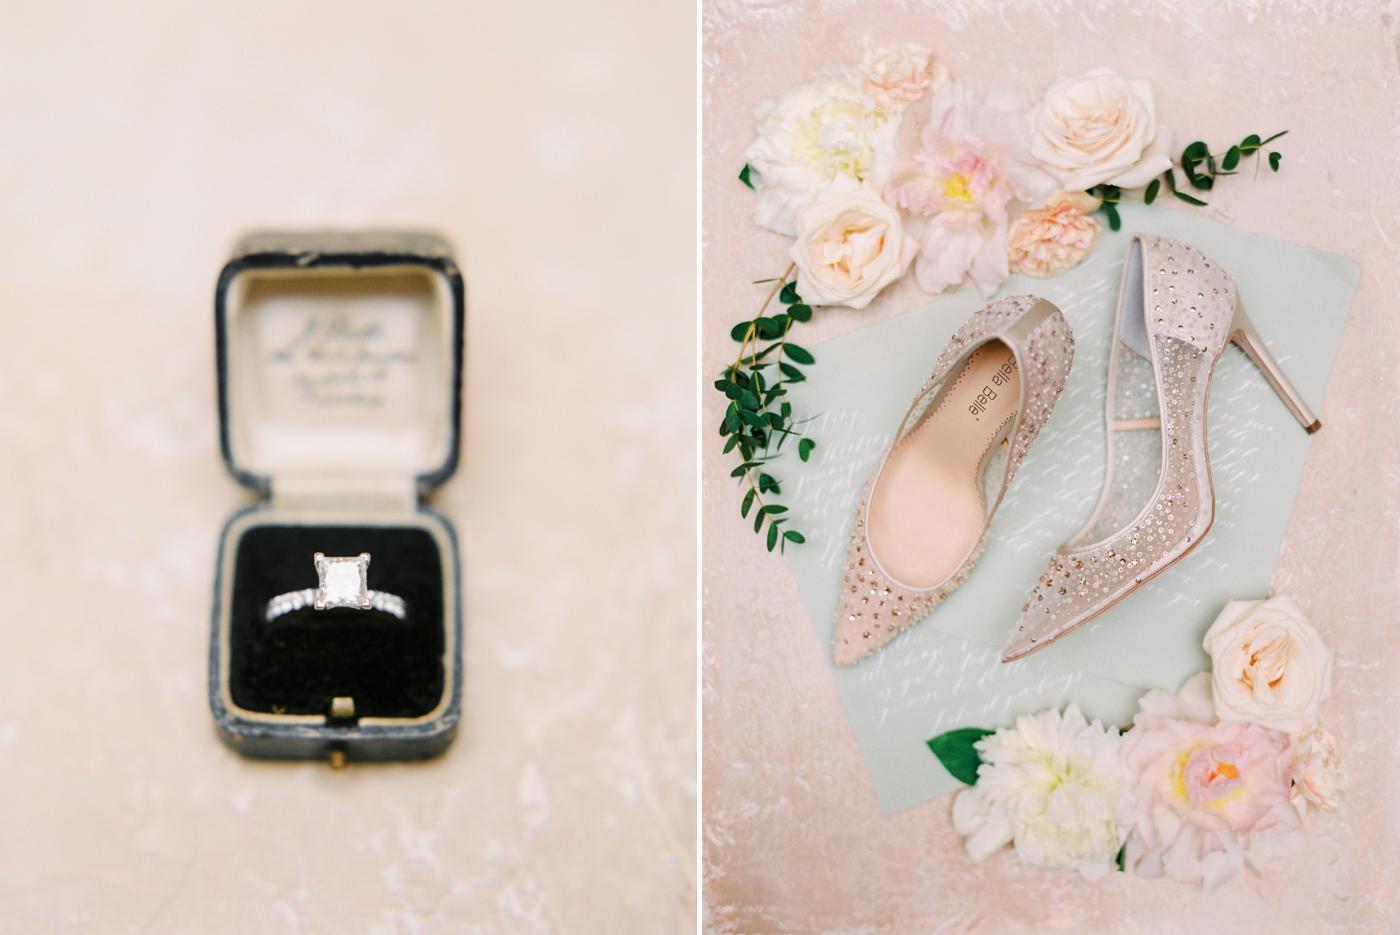 Venice italy wedding photographers | long sleeve wedding dress | italy vow renewal | justine milton fine art film photographer | engagement ring wedding ring photo